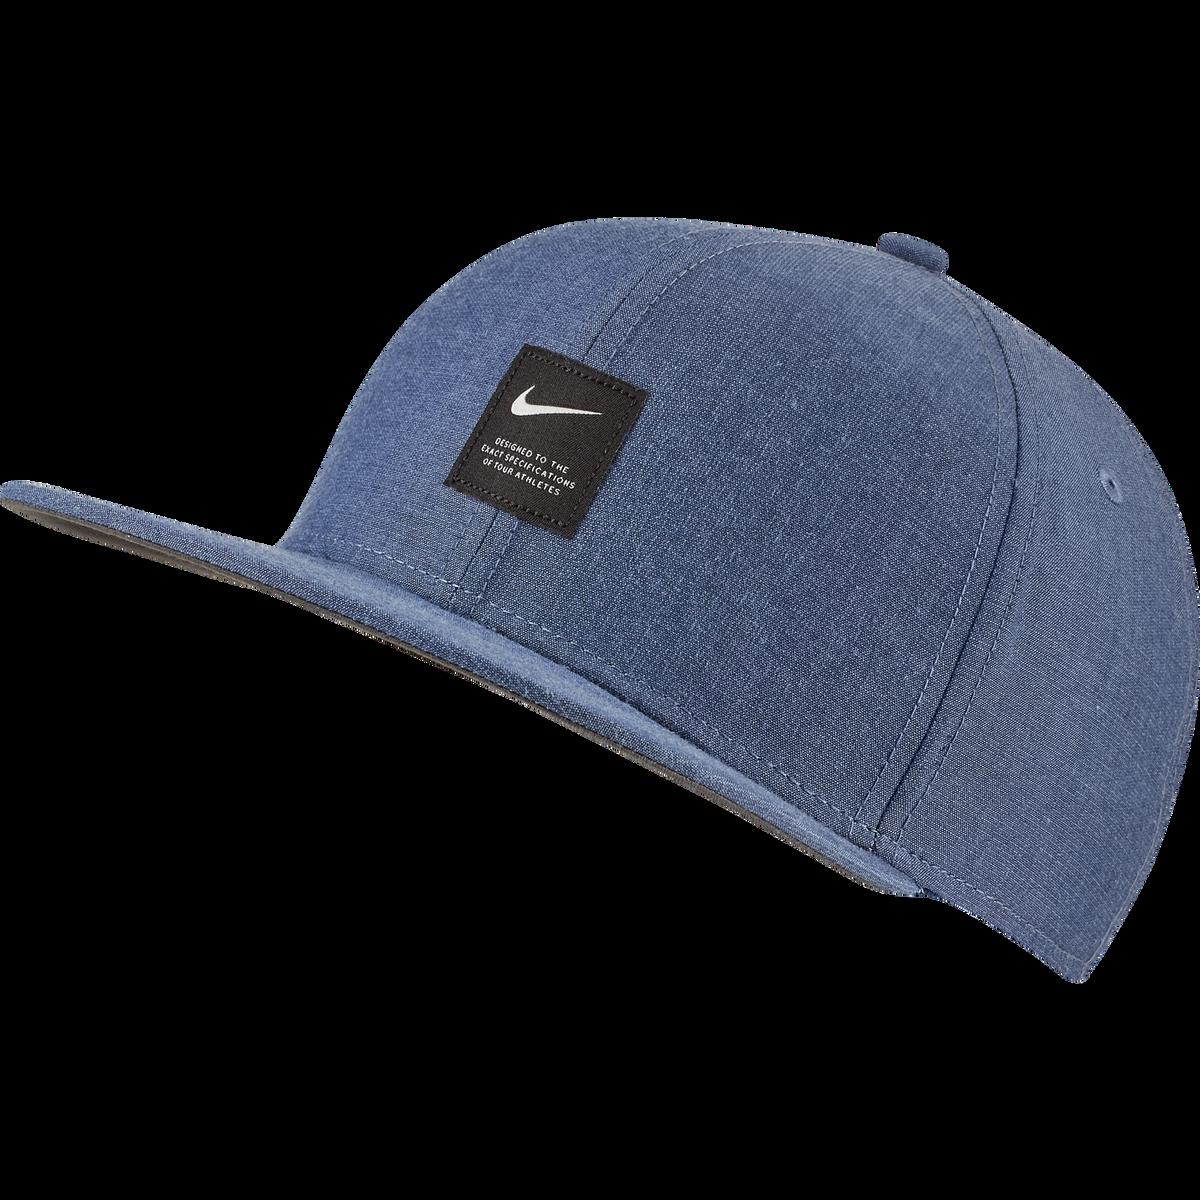 4ec132dd0ae Images. AeroBill Pro Hat Majors